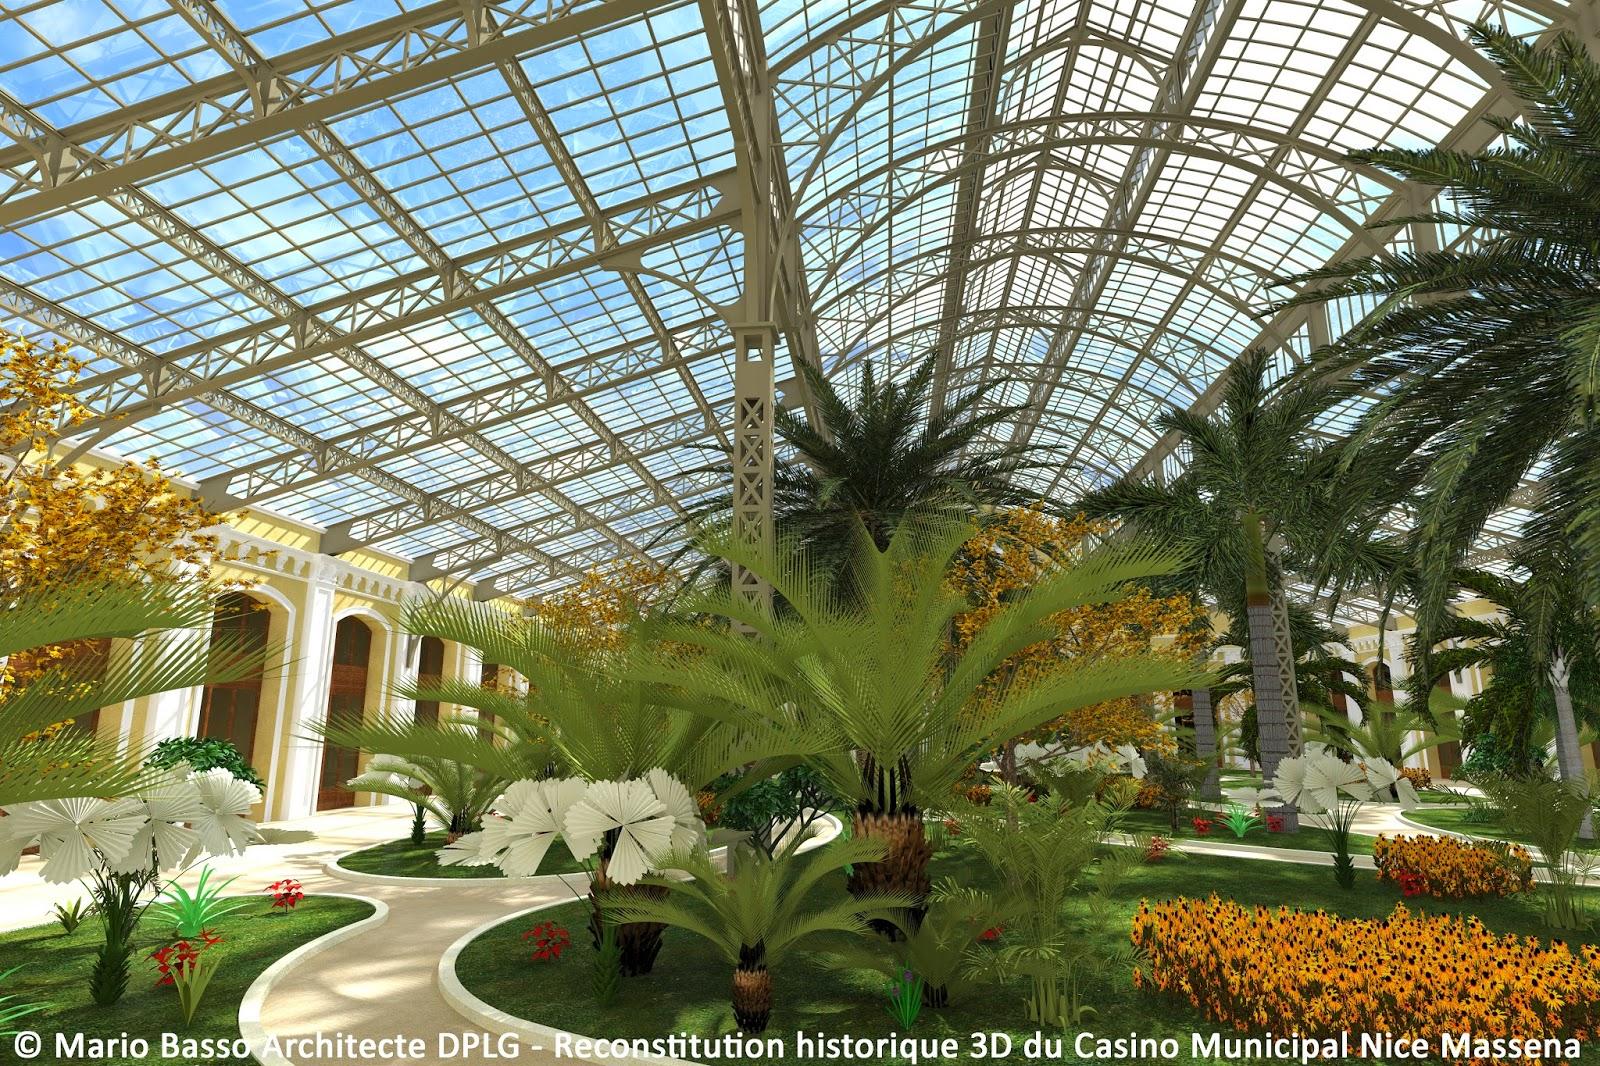 Casino municipal nice massena en 3d vues du jardin d 39 hiver for Entretien du jardin en hiver